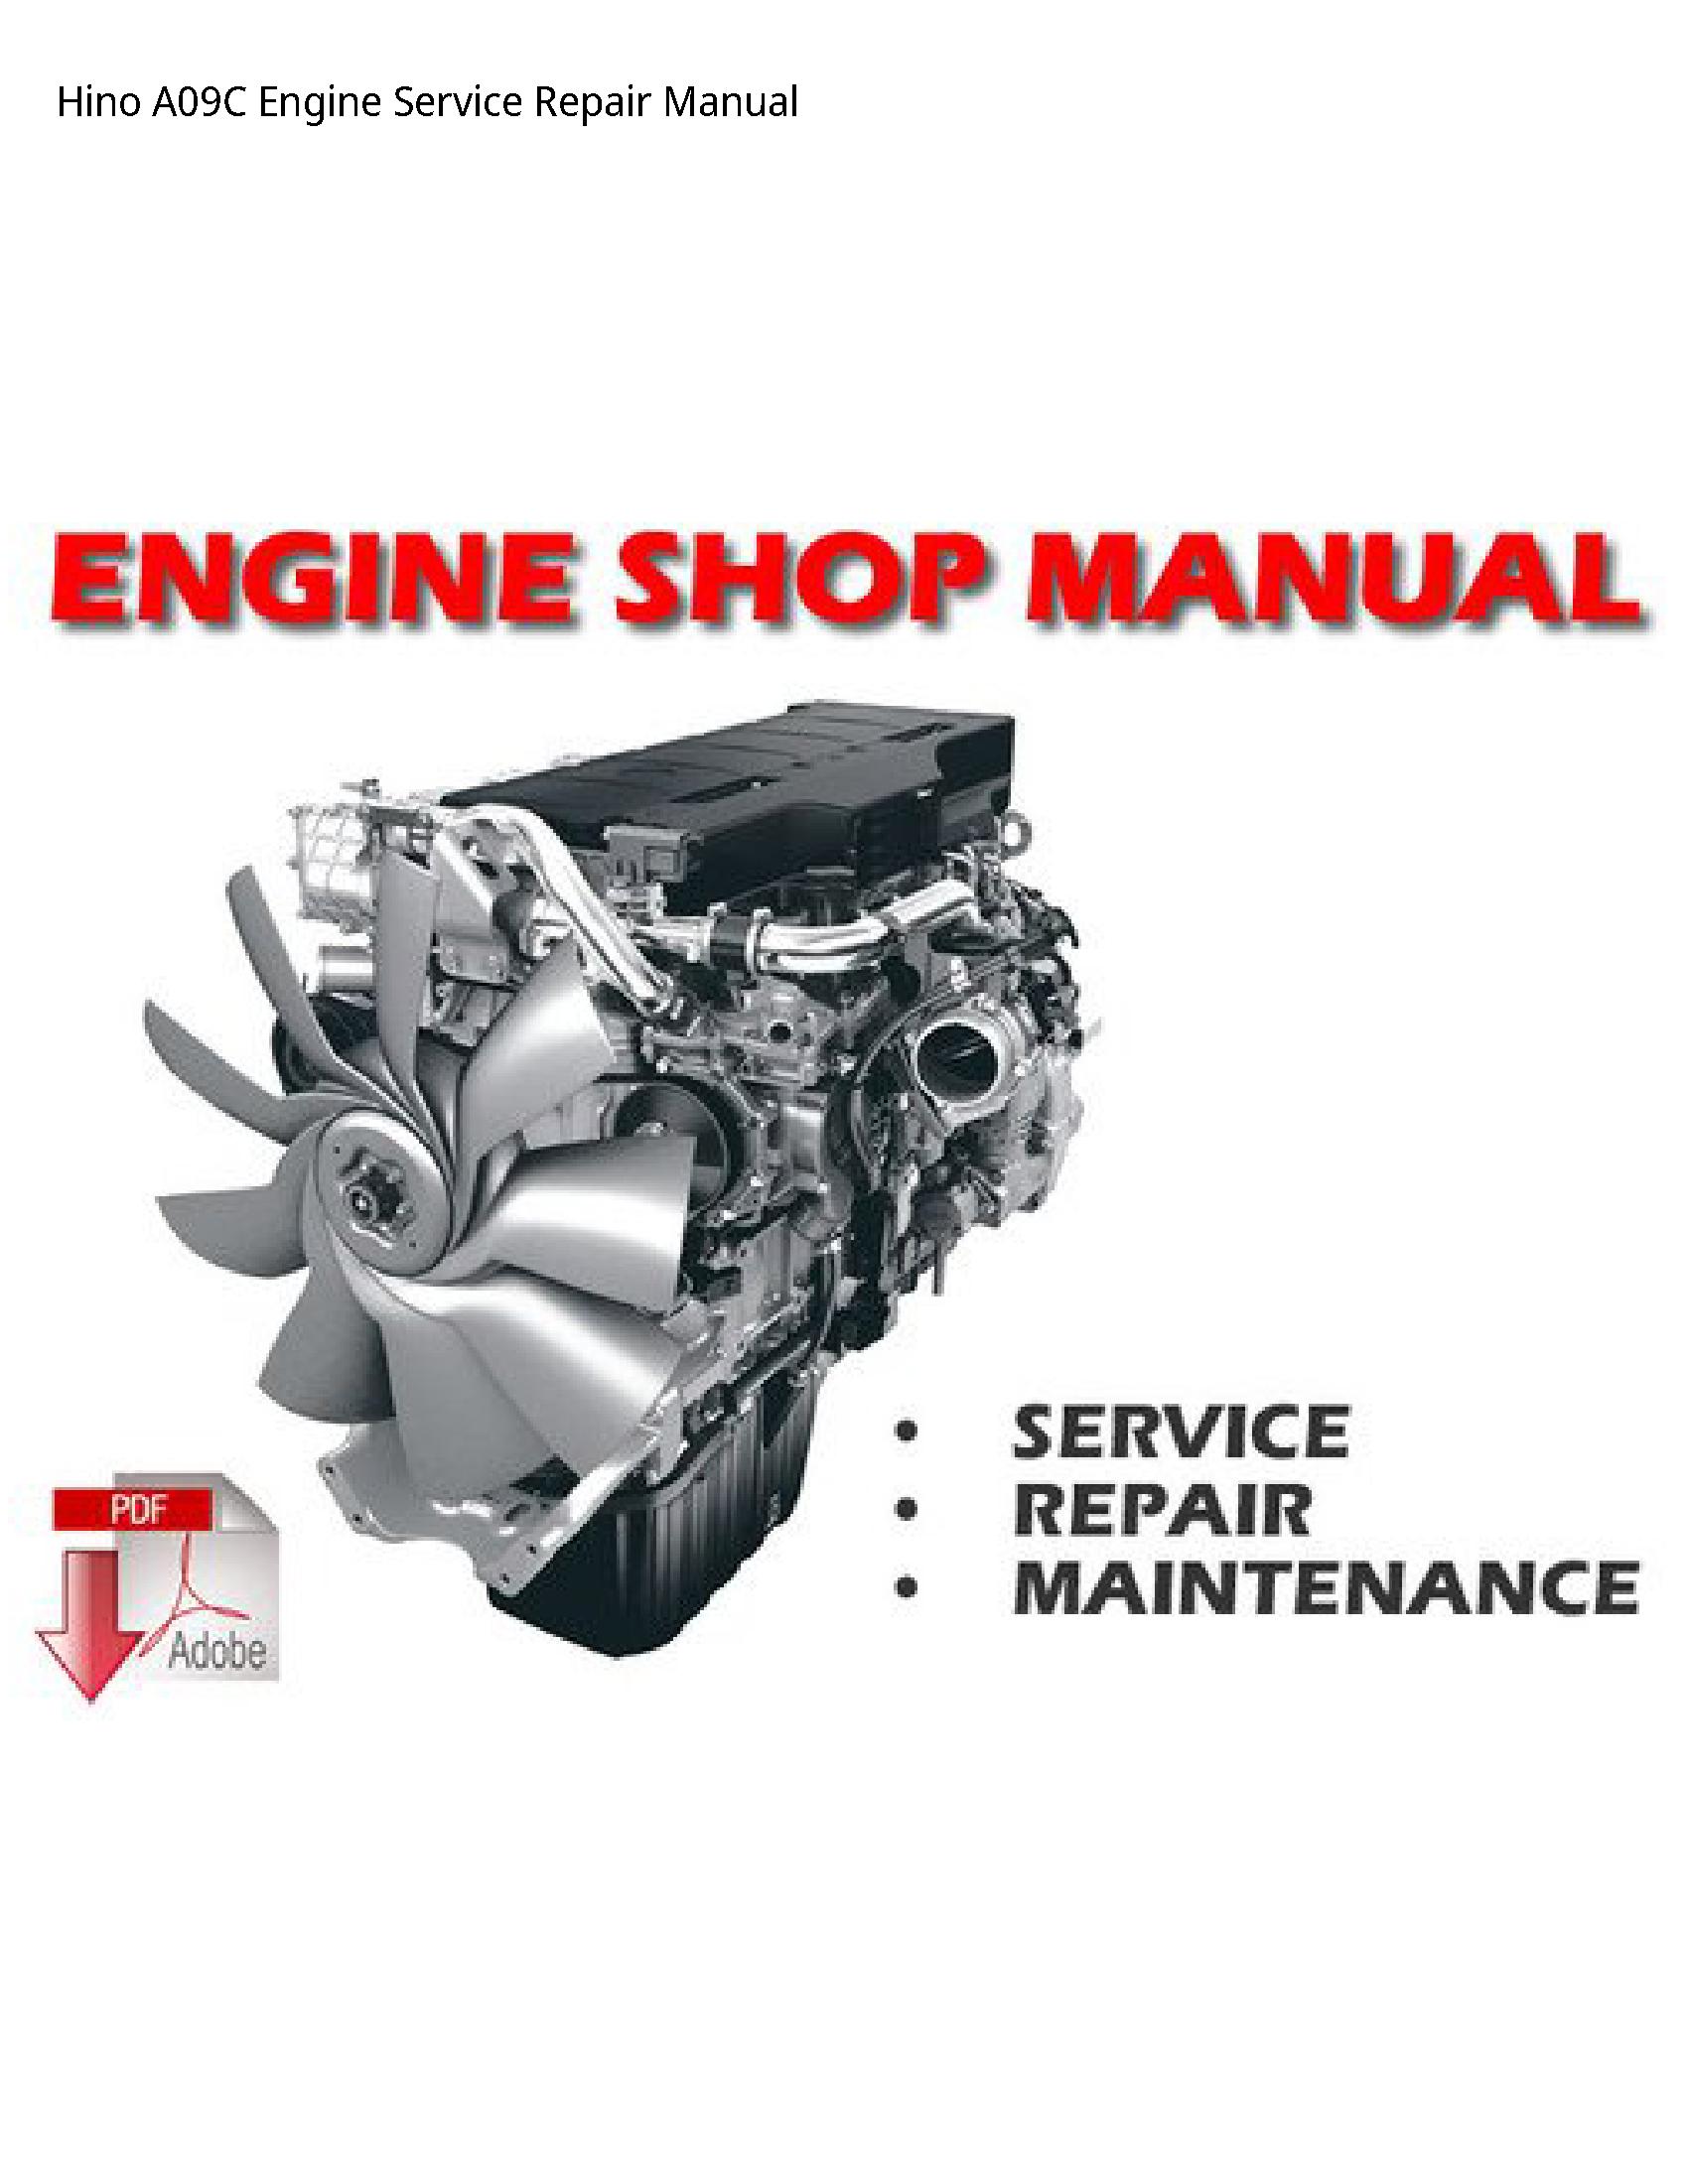 Hino A09C Engine manual